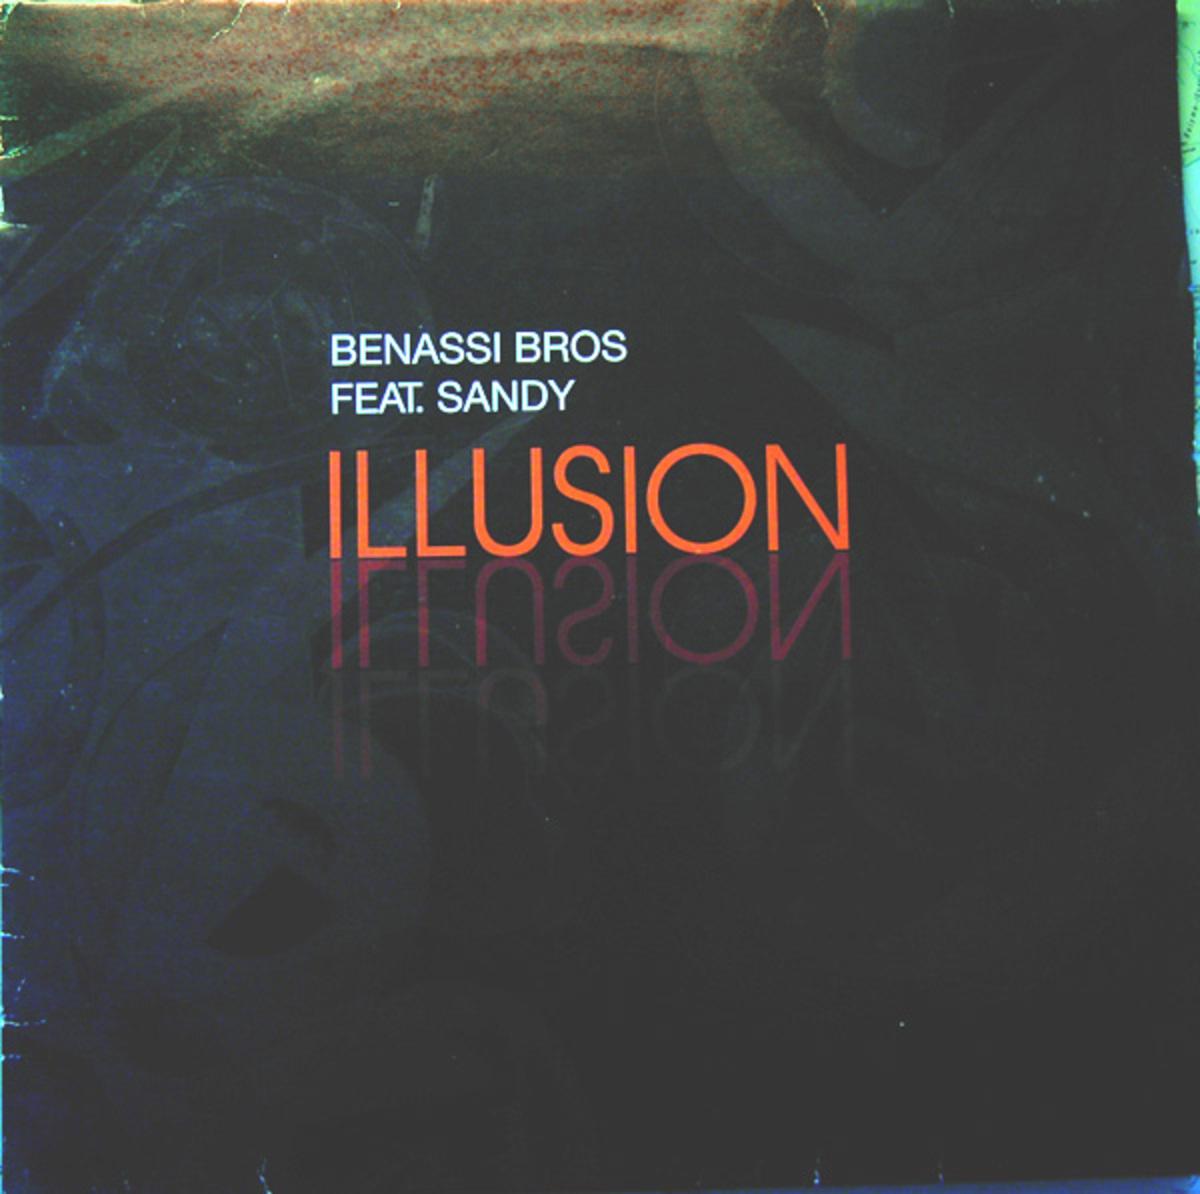 Benassi Bros Feat. Sandy - Illusion (Zastavnyy Edit)